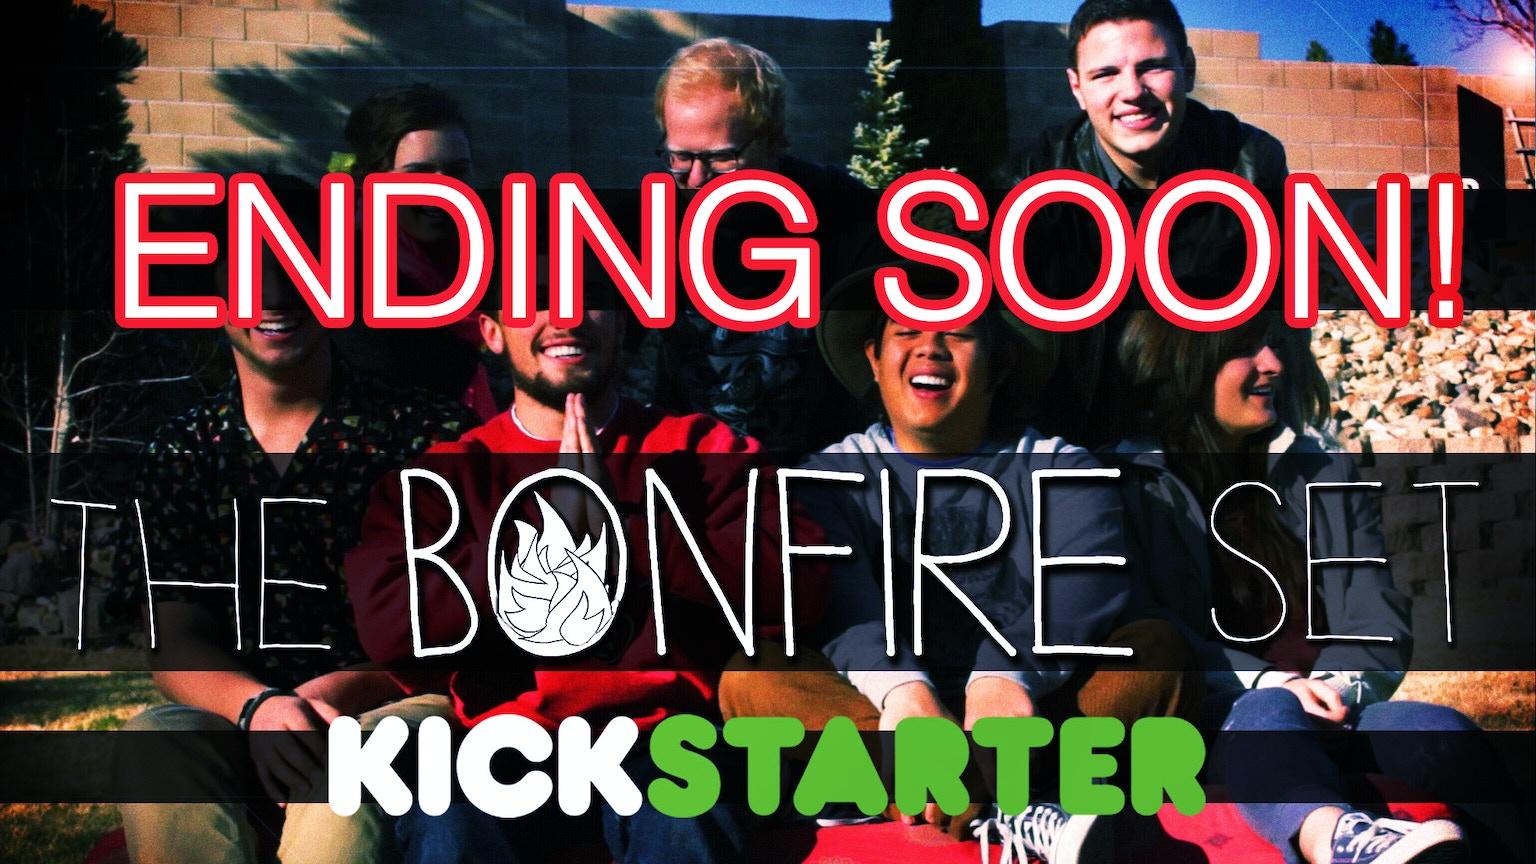 create an ep with the bonfire set by the bonfire set kickstarter. Black Bedroom Furniture Sets. Home Design Ideas